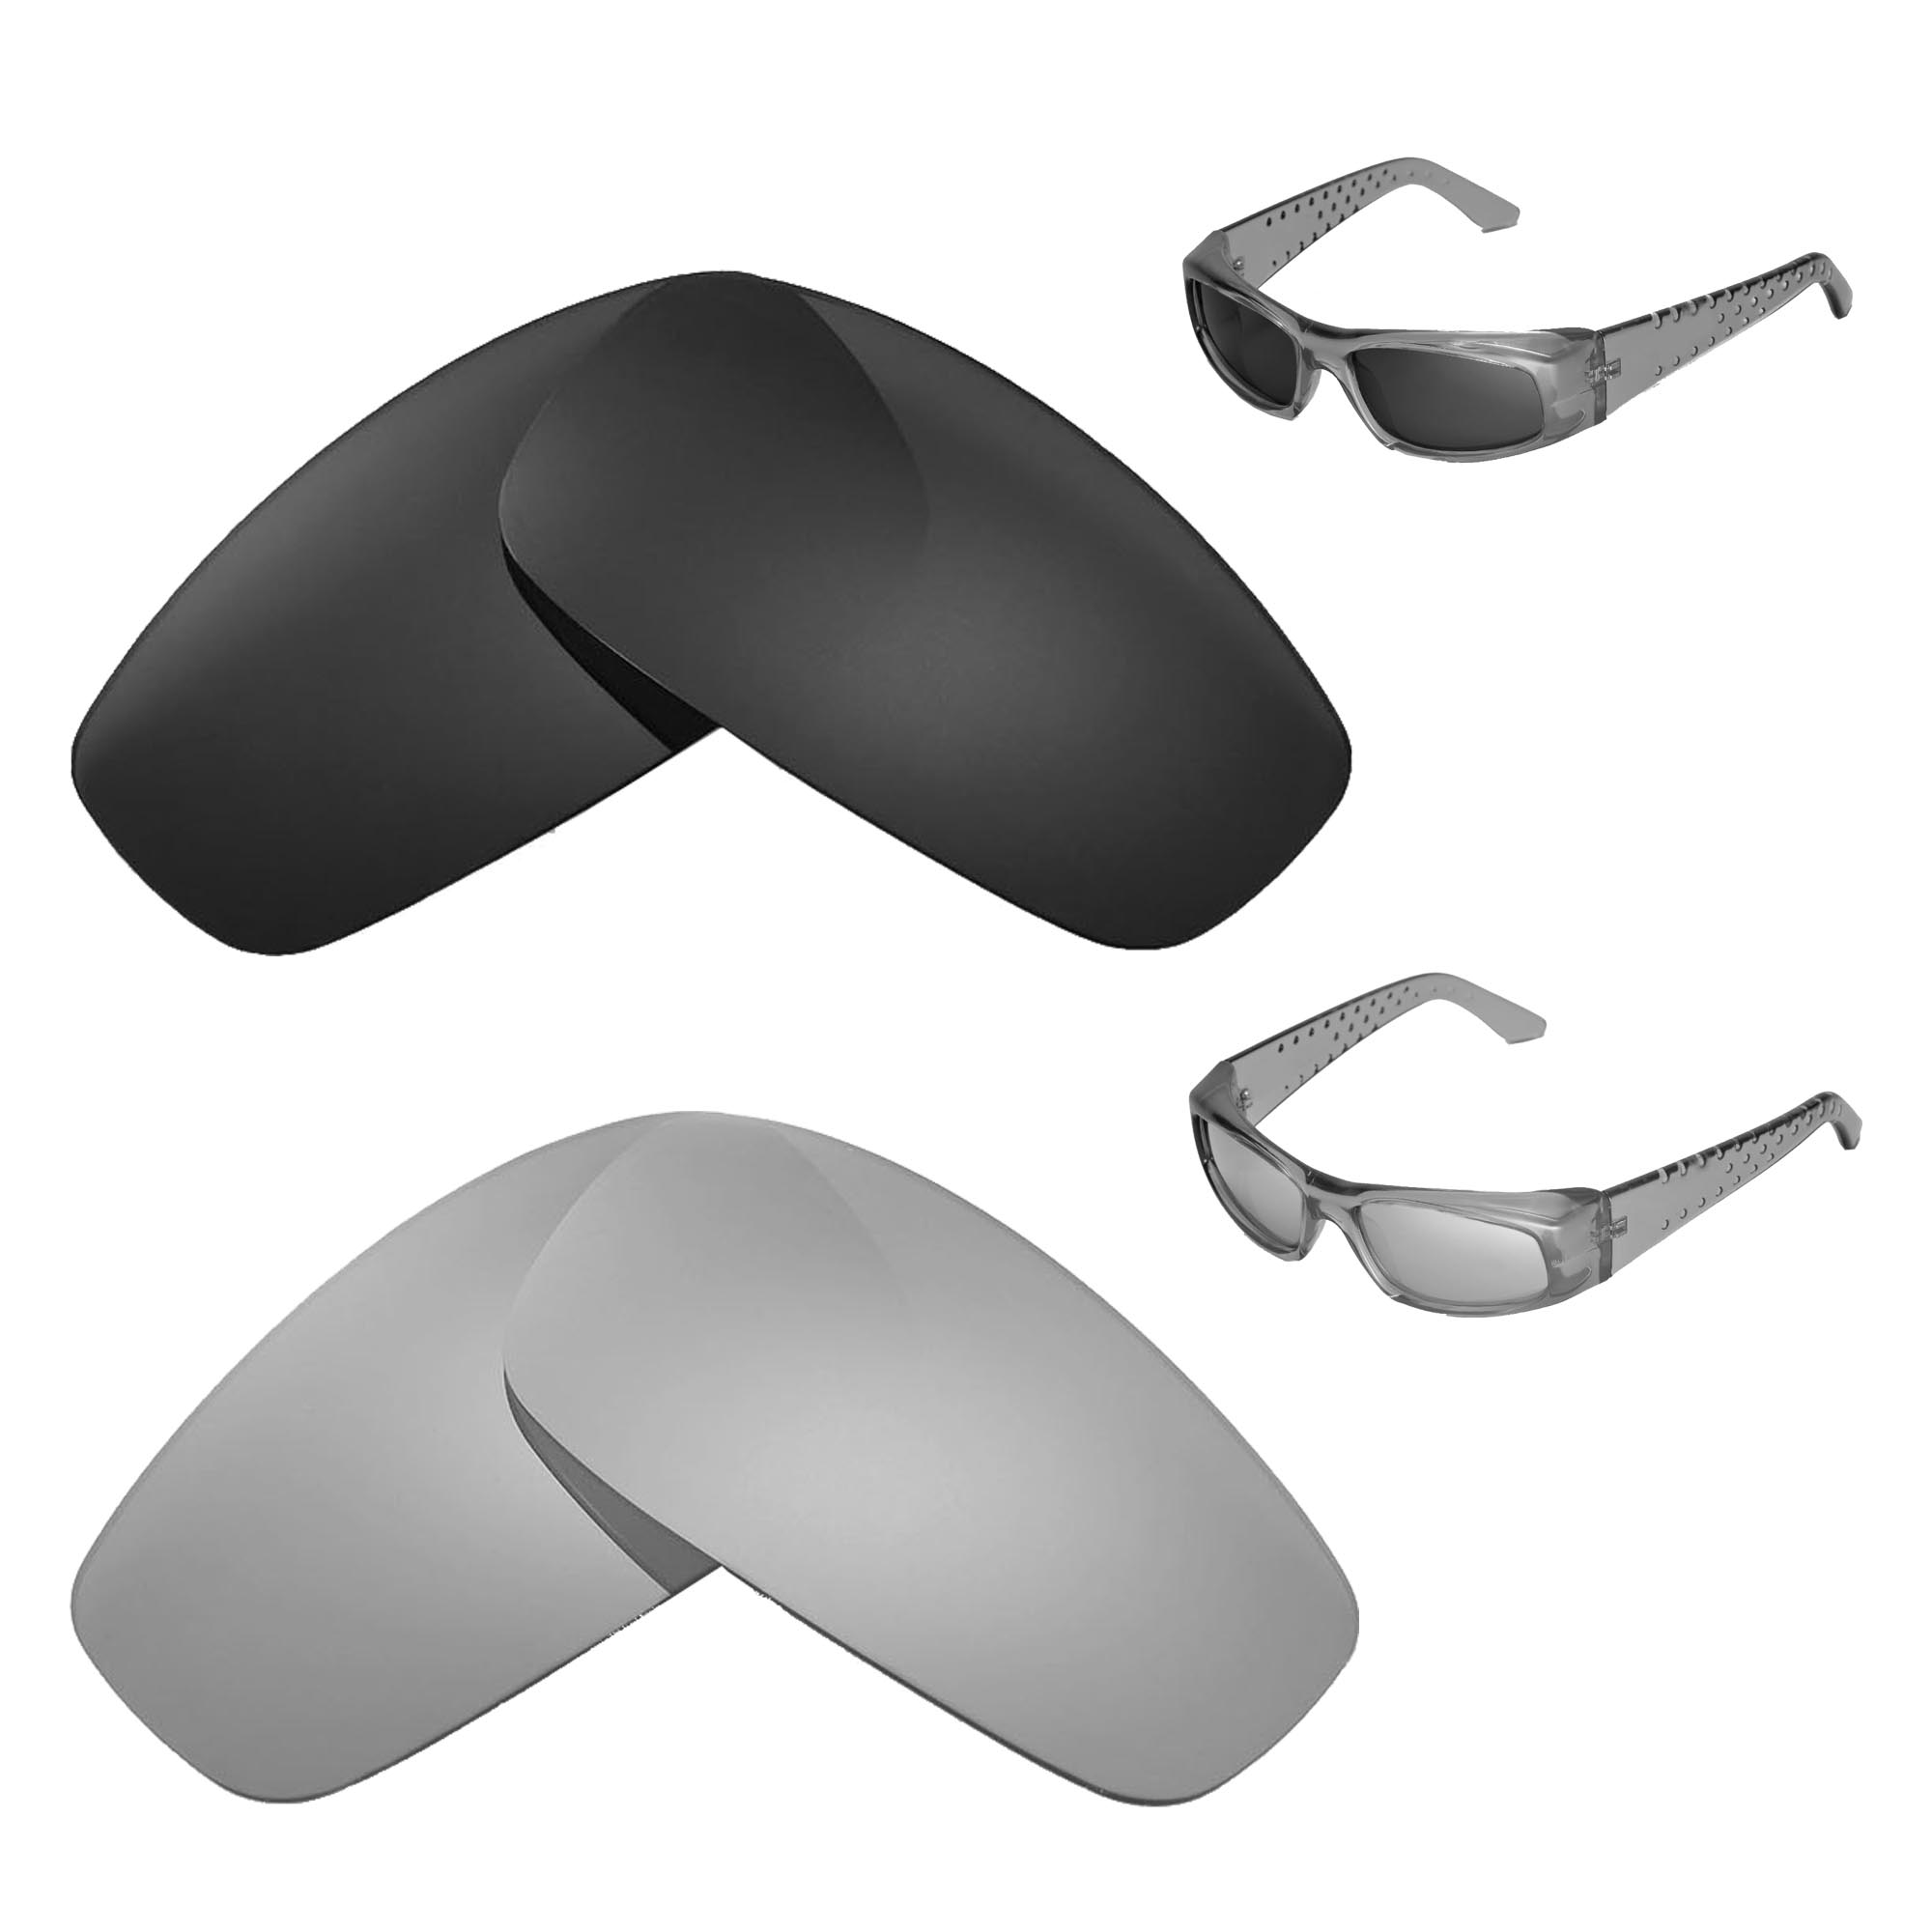 62e52420792 Details about Walleva Polarized Black+Titanium Replacement Lenses For Spy  Optic MC Sunglasses